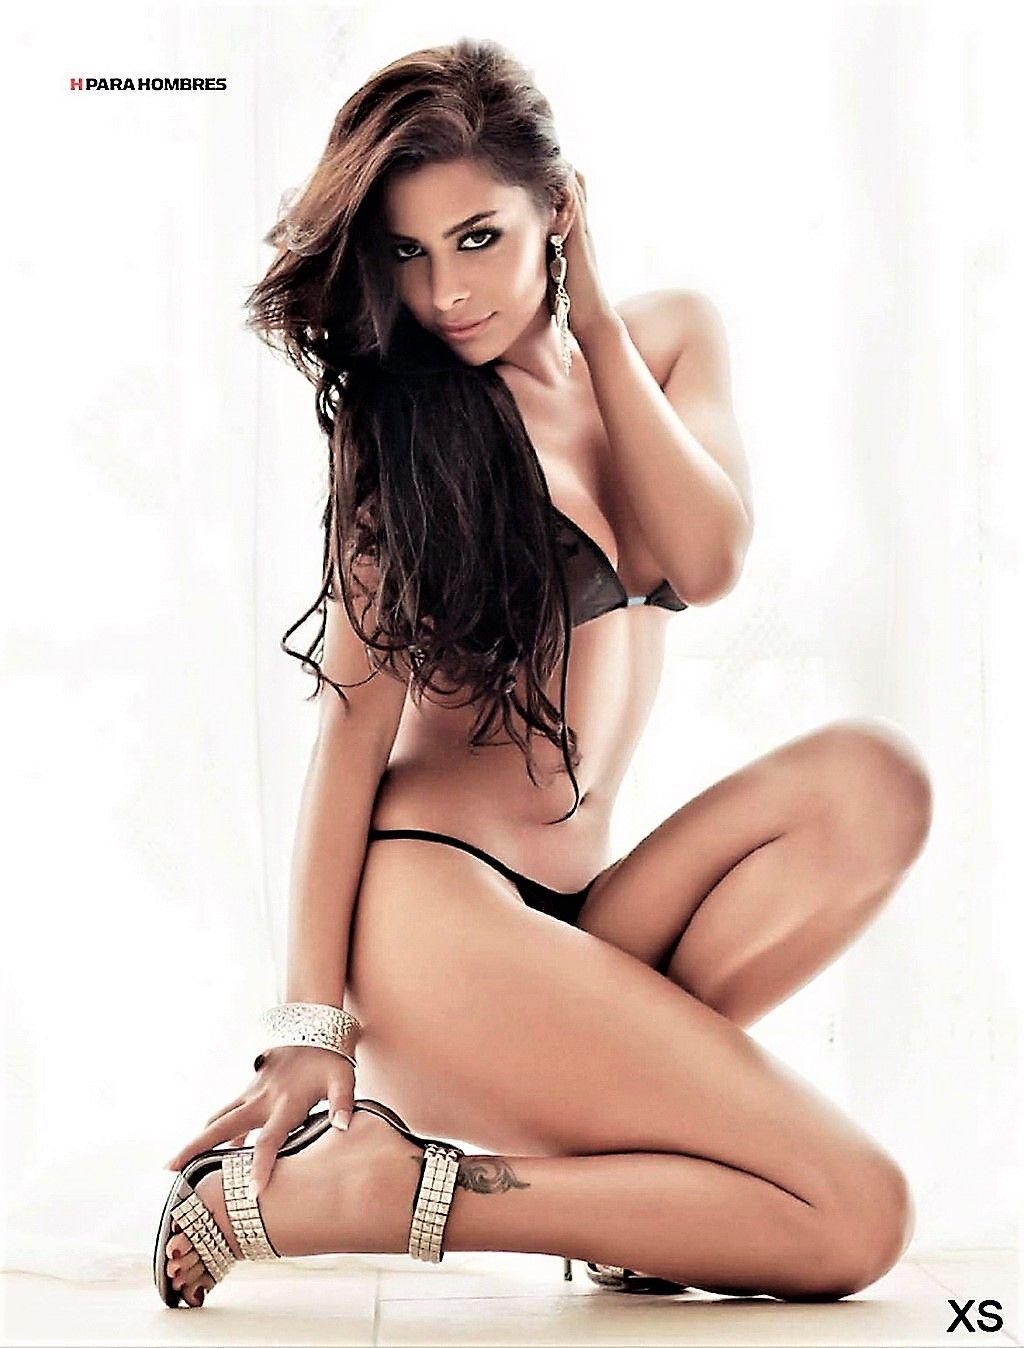 nude (12 photo), Is a cute Celebrites image